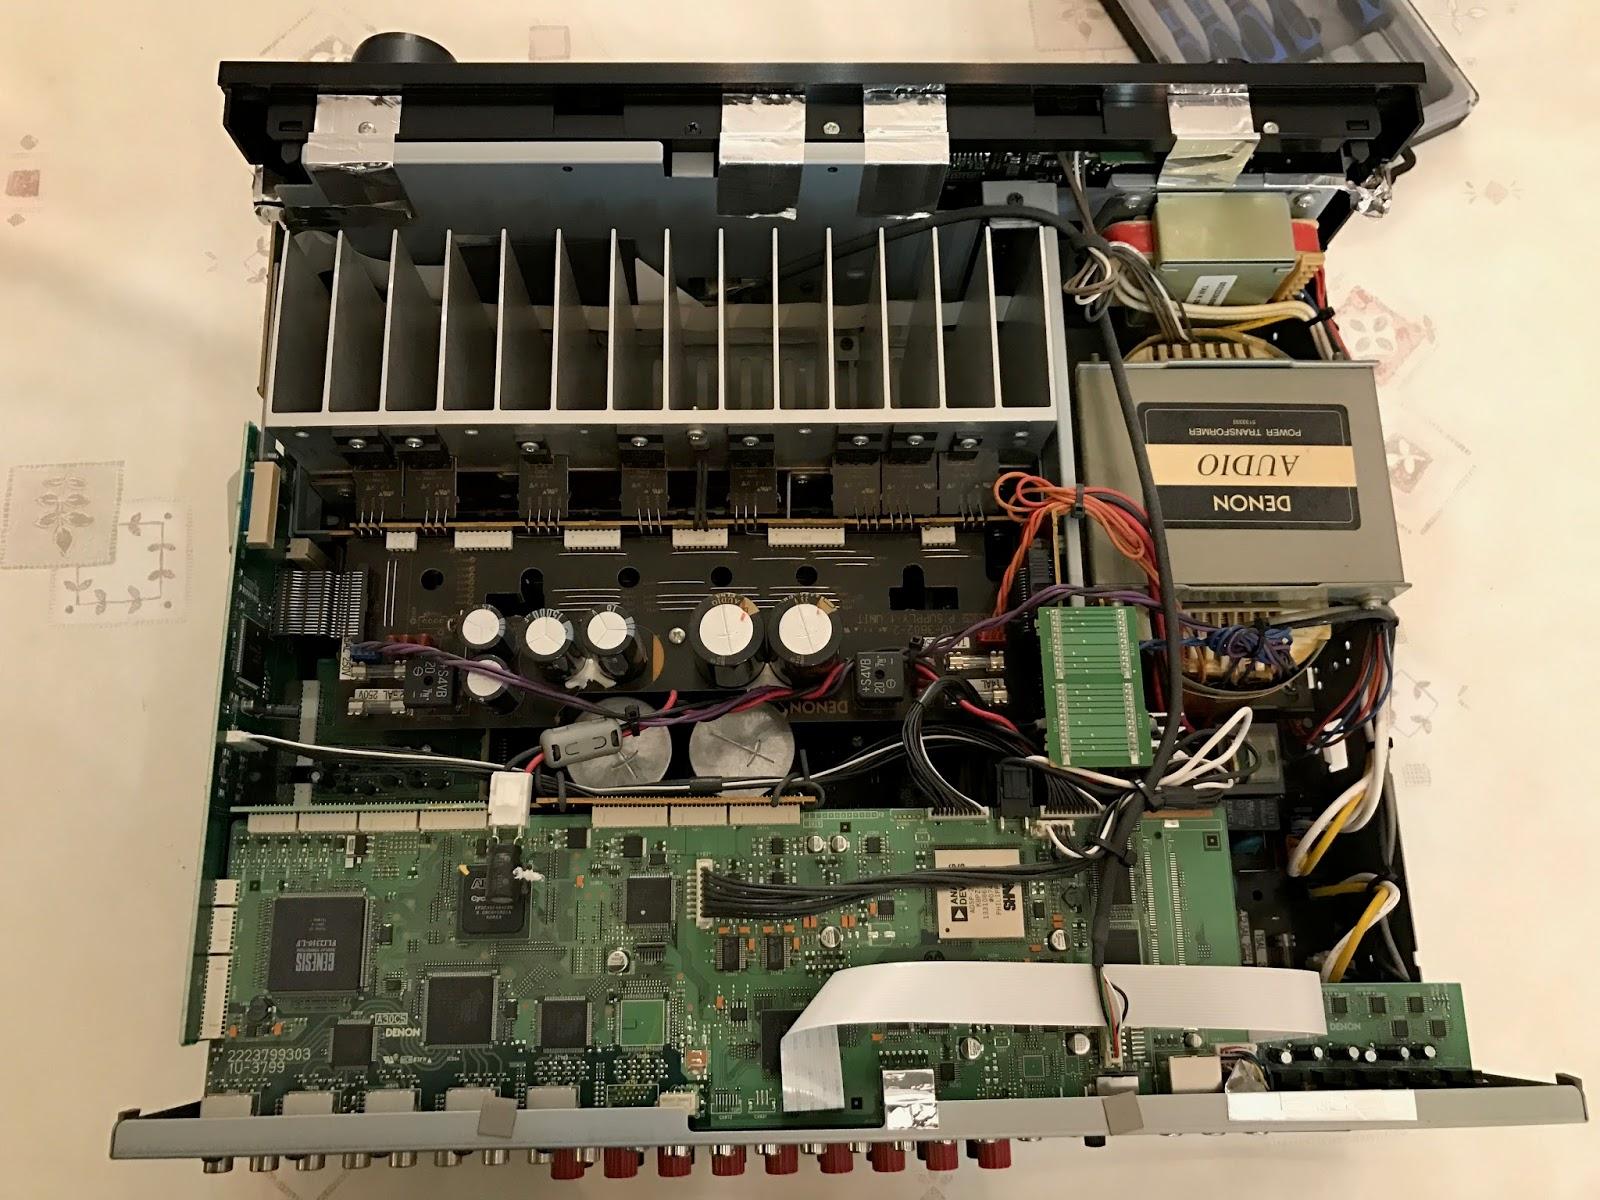 just some stuff denon avr 3808 left speaker sound problem rh blog debrakeleer com avr-3808ci manual denon 3808 manual